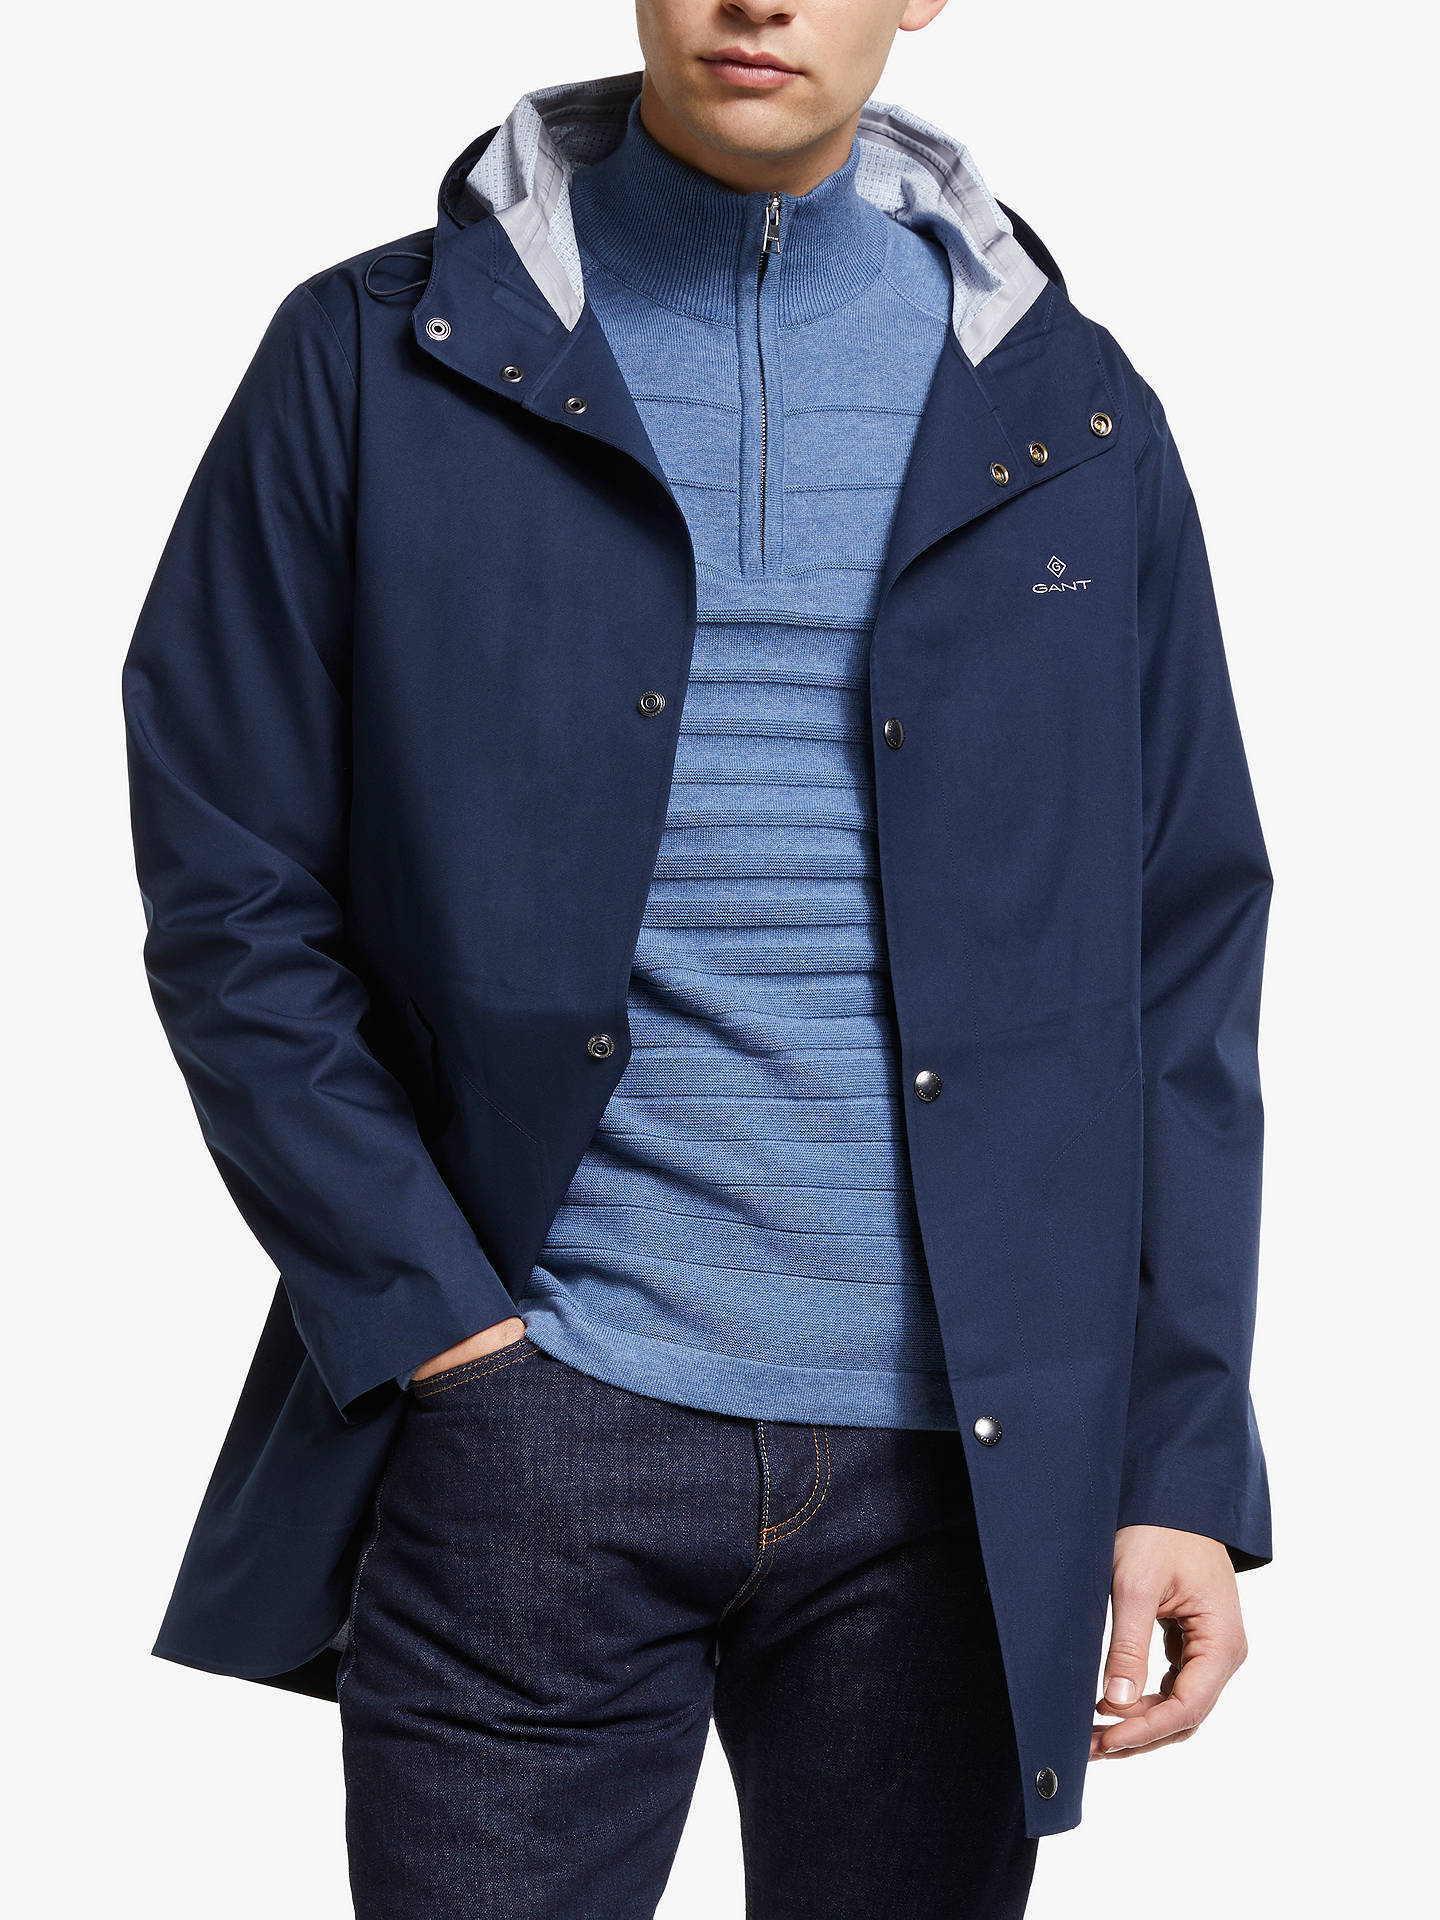 3999aa921ad Buy GANT Mid Length Hooded Jacket, Marine, S Online at johnlewis.com ...